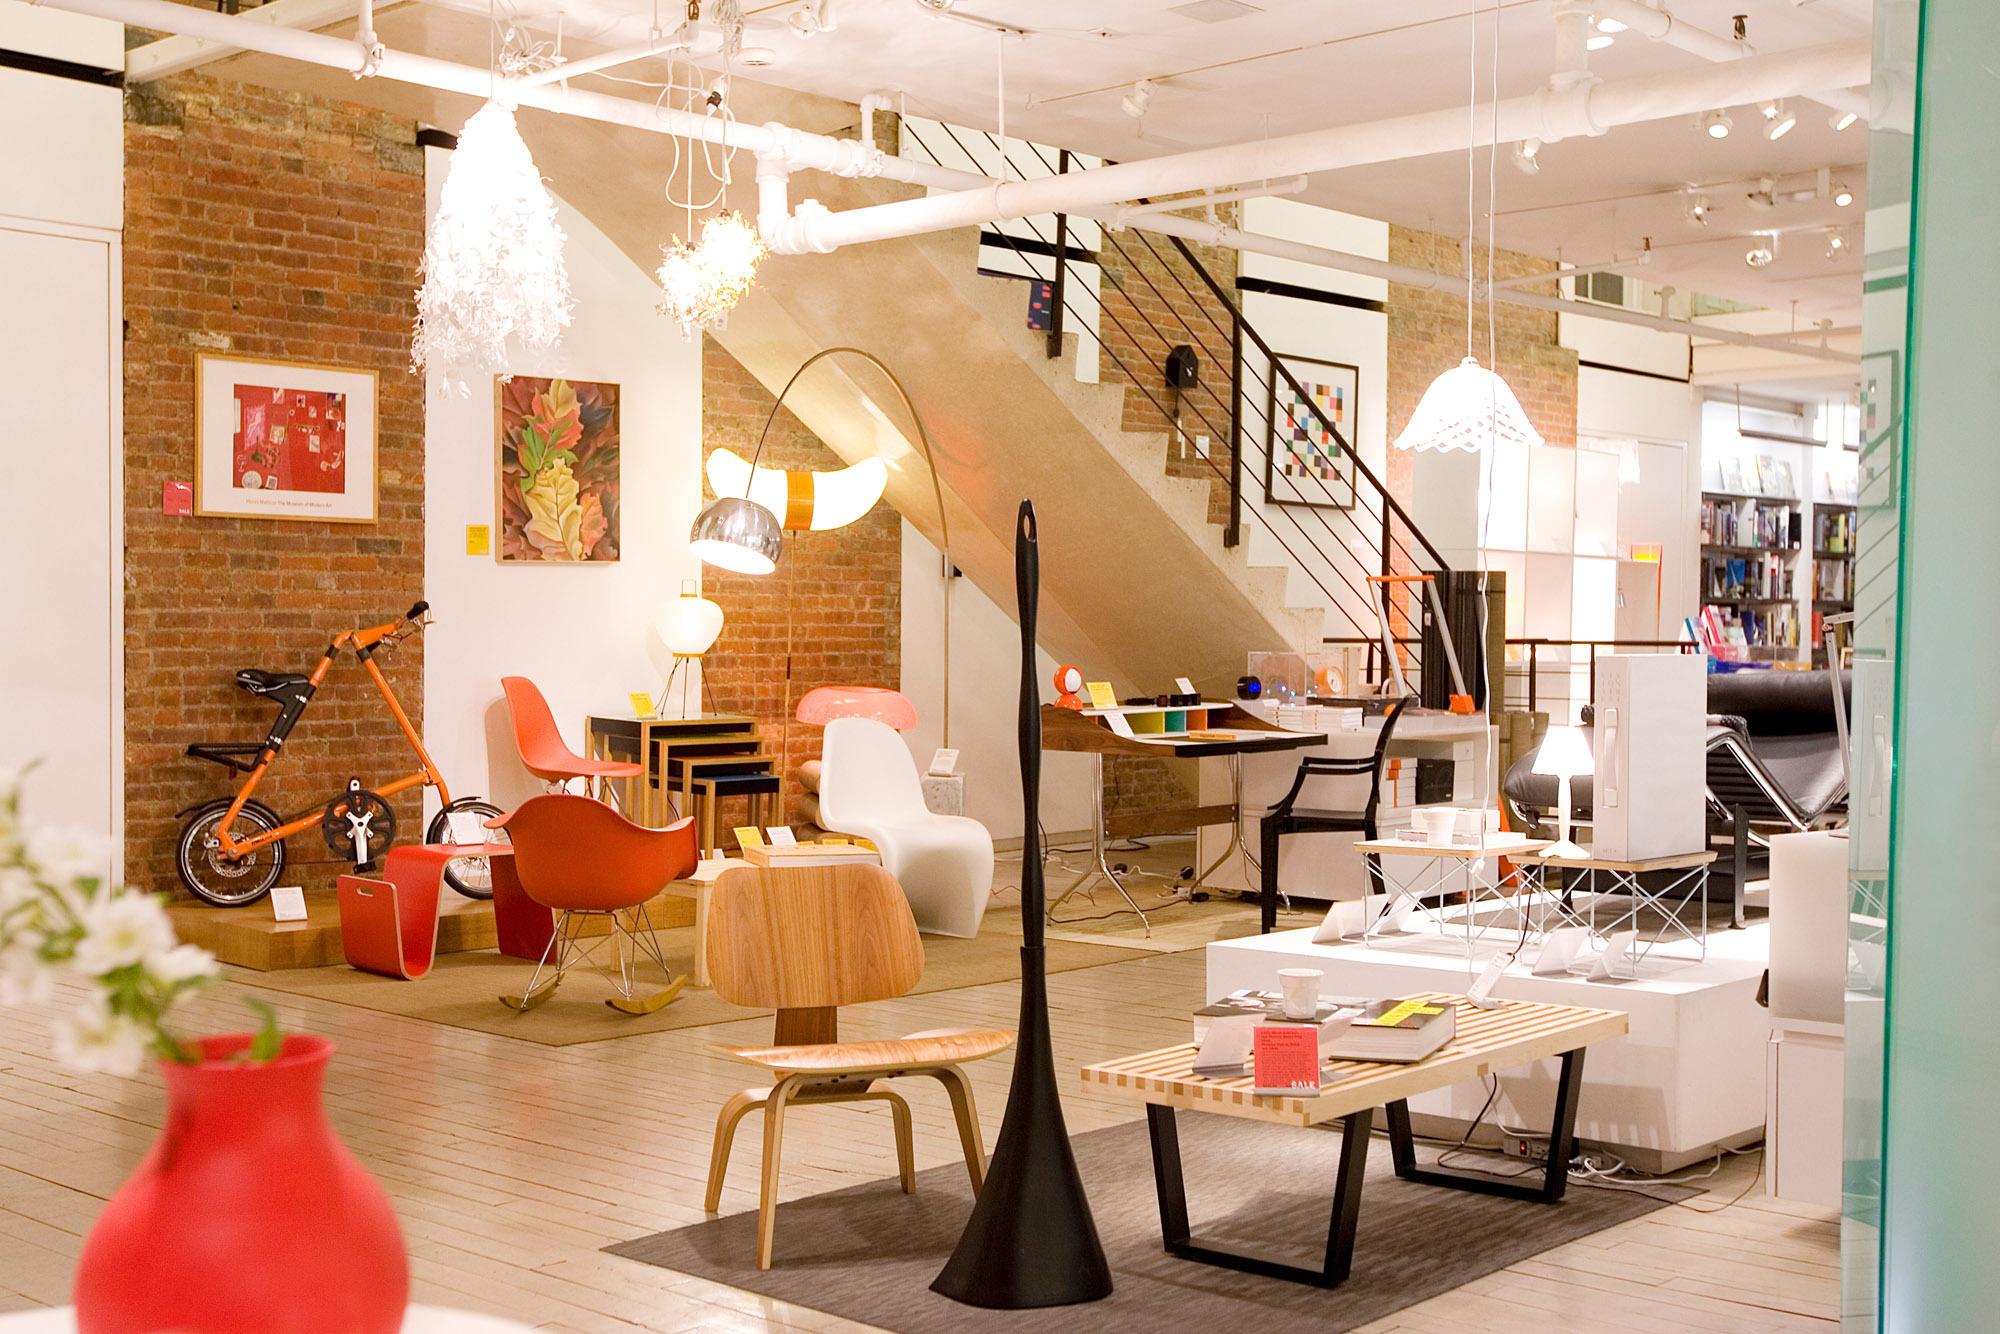 image gallery moma design store soho. Black Bedroom Furniture Sets. Home Design Ideas